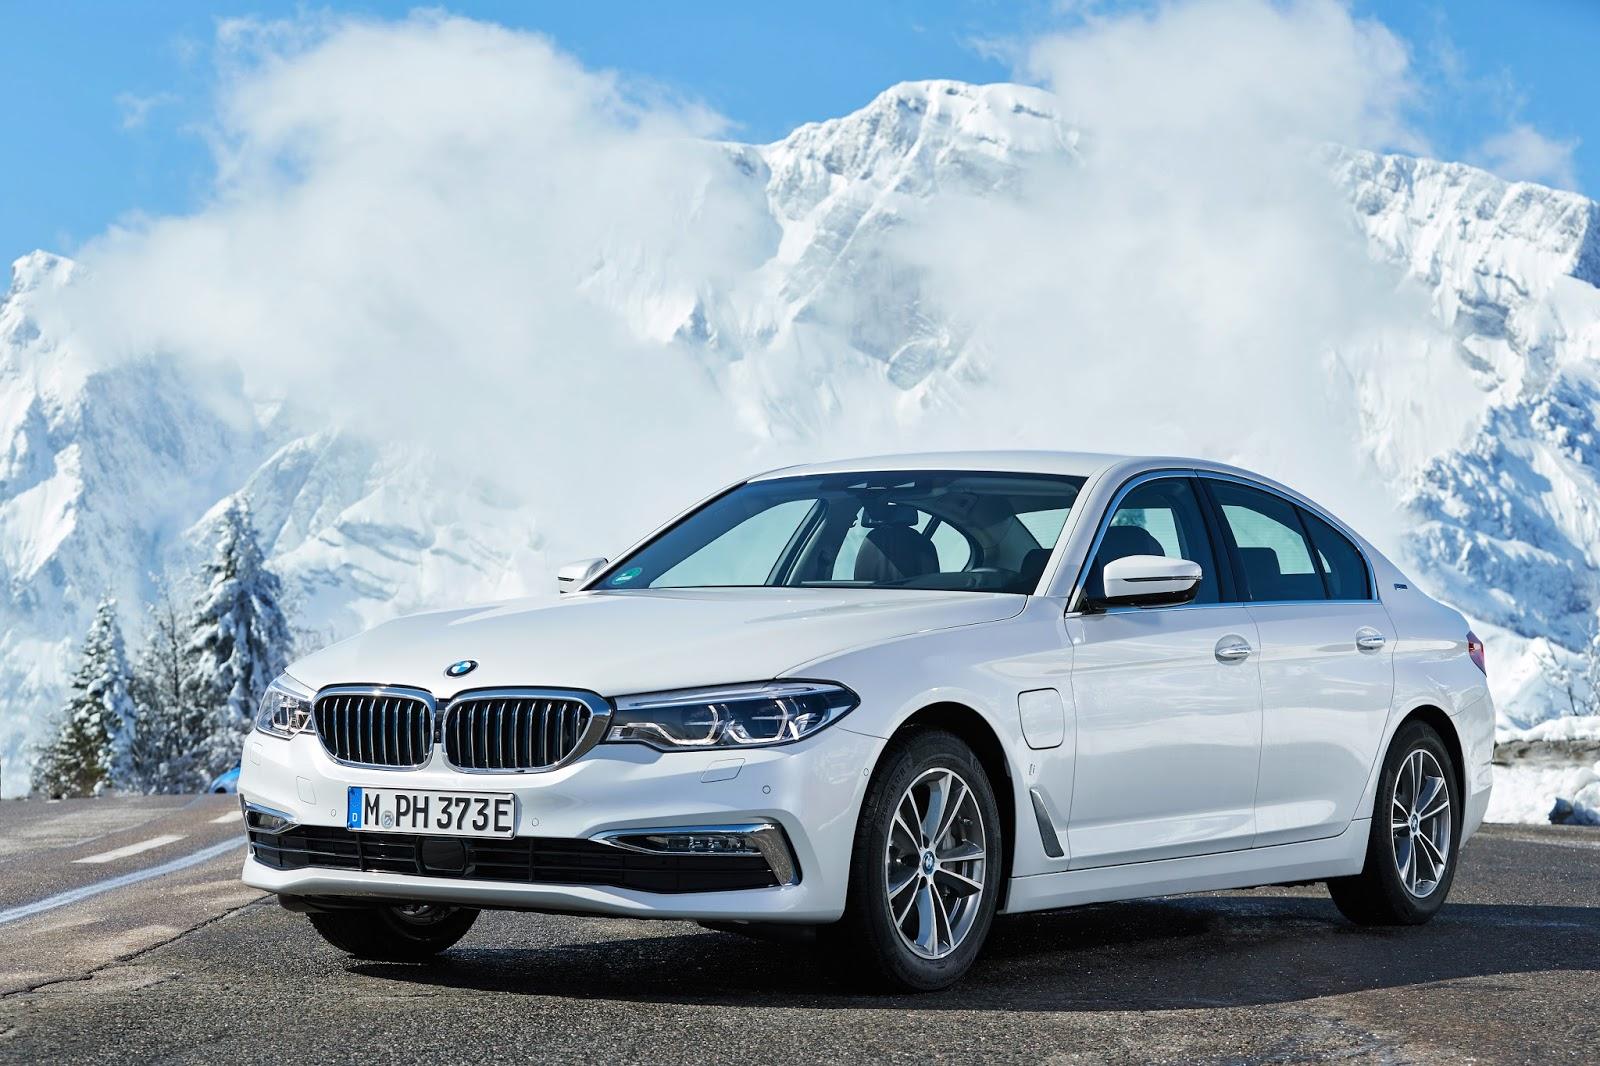 P90256338 highRes the new bmw 530e ipe Η BMW 530e iPerformance φέρνει την ηλεκτρική επανάσταση BMW, BMW 5, BMW 530e iPerformance, Electric cars, Hybrid, Λανσάρισμα